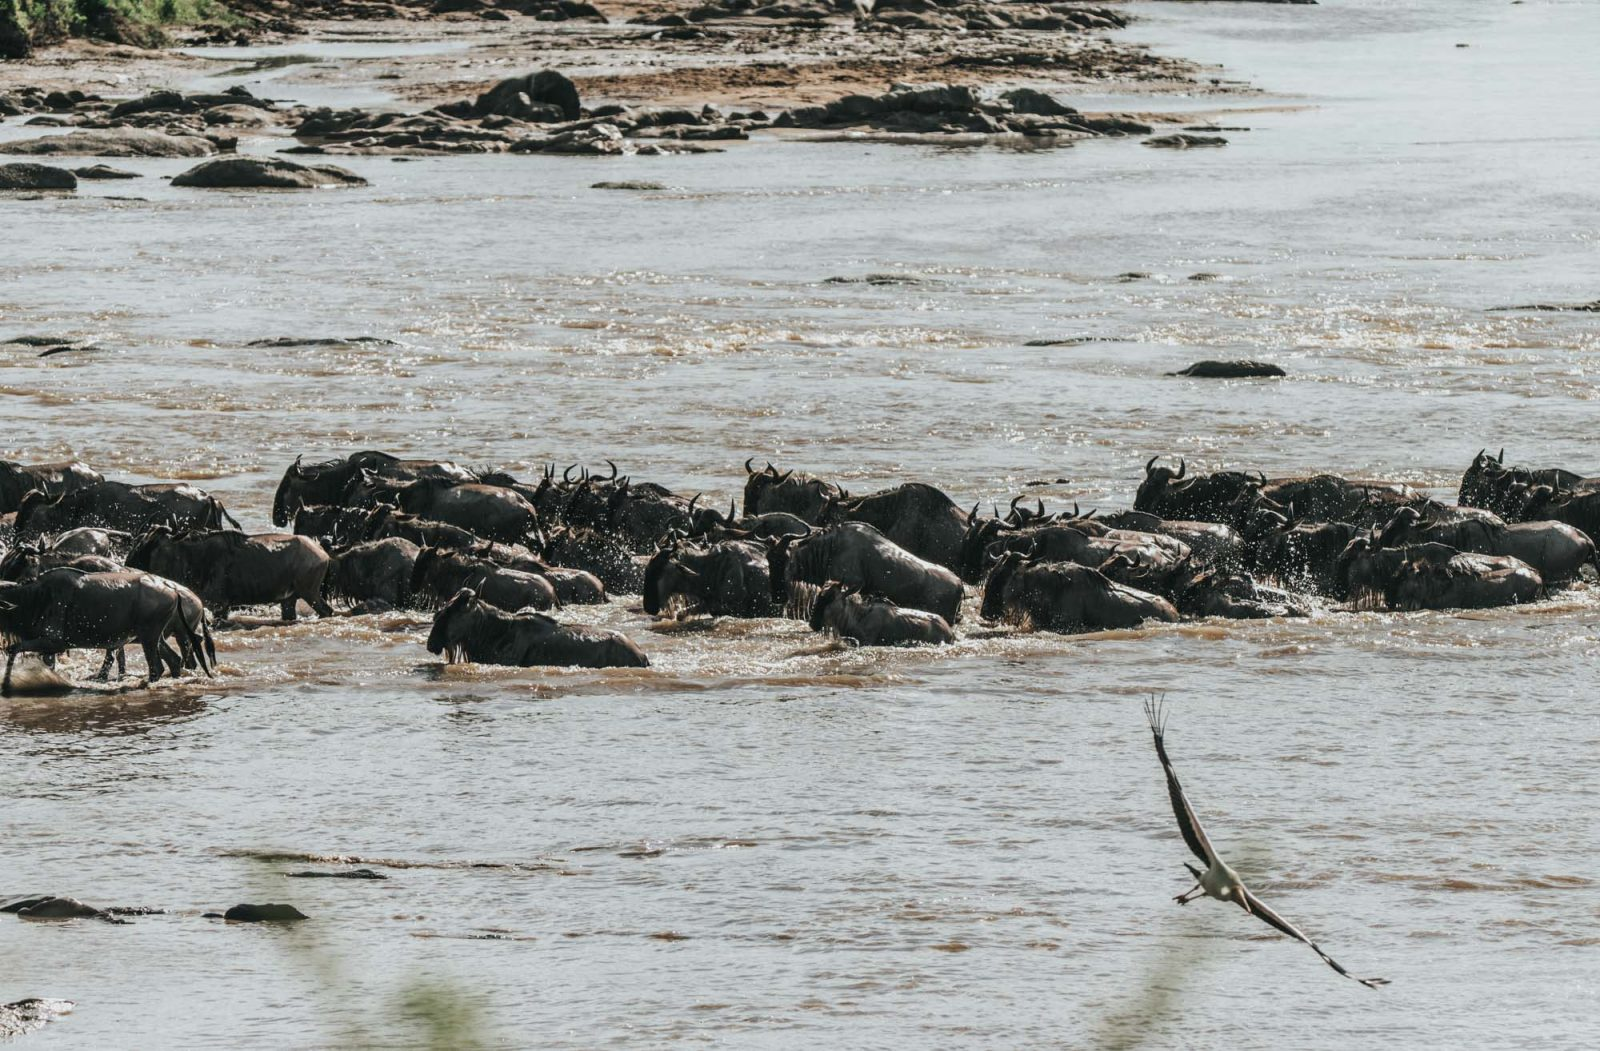 Serengeti Safari, wildebeest